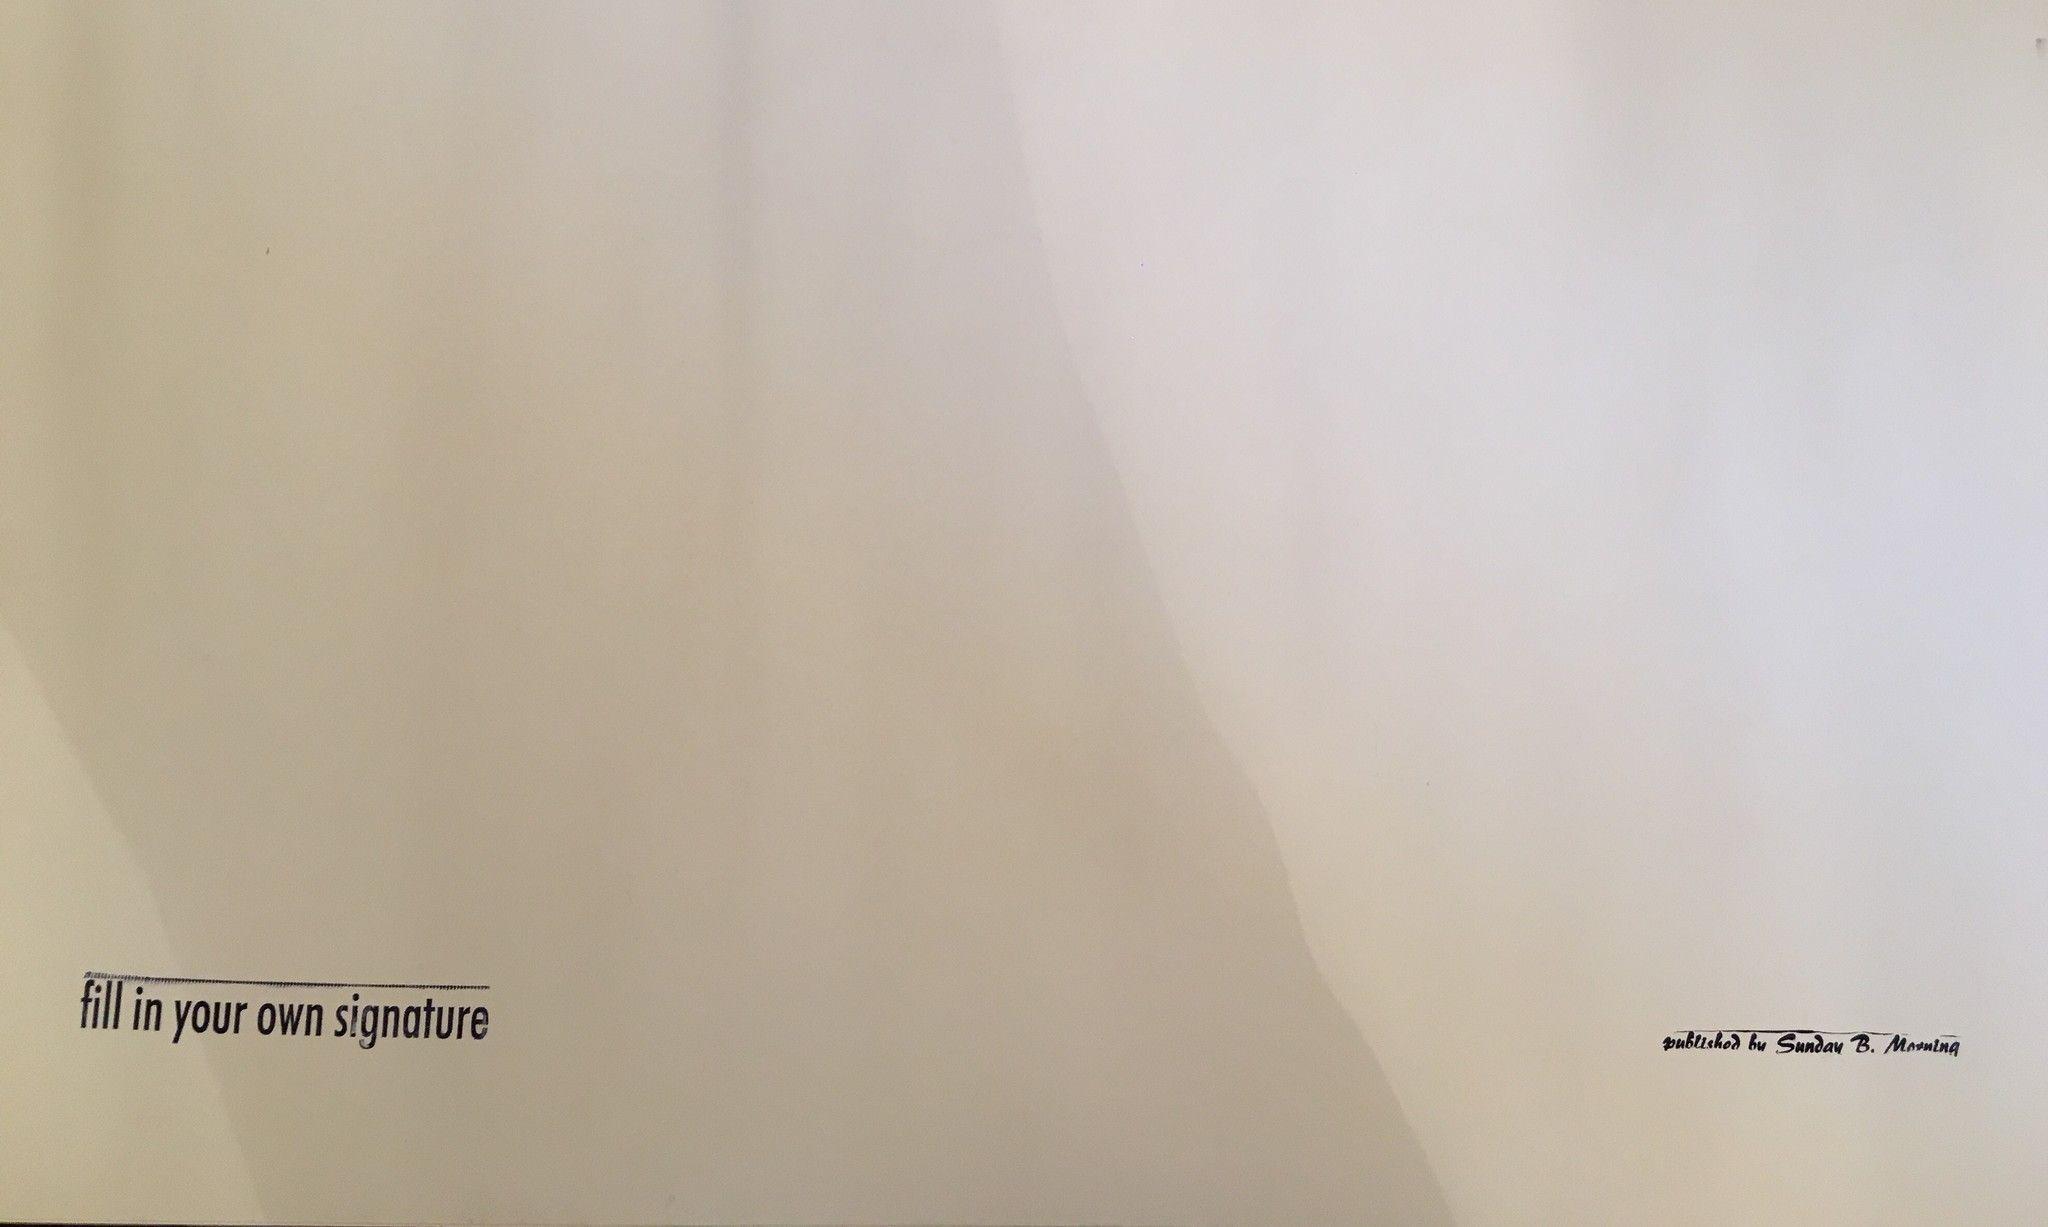 SERIGRAFIA ANDY WARHOL ' MARILYN 7 '  dimensioni L 91,5 x H 91,5 cm.